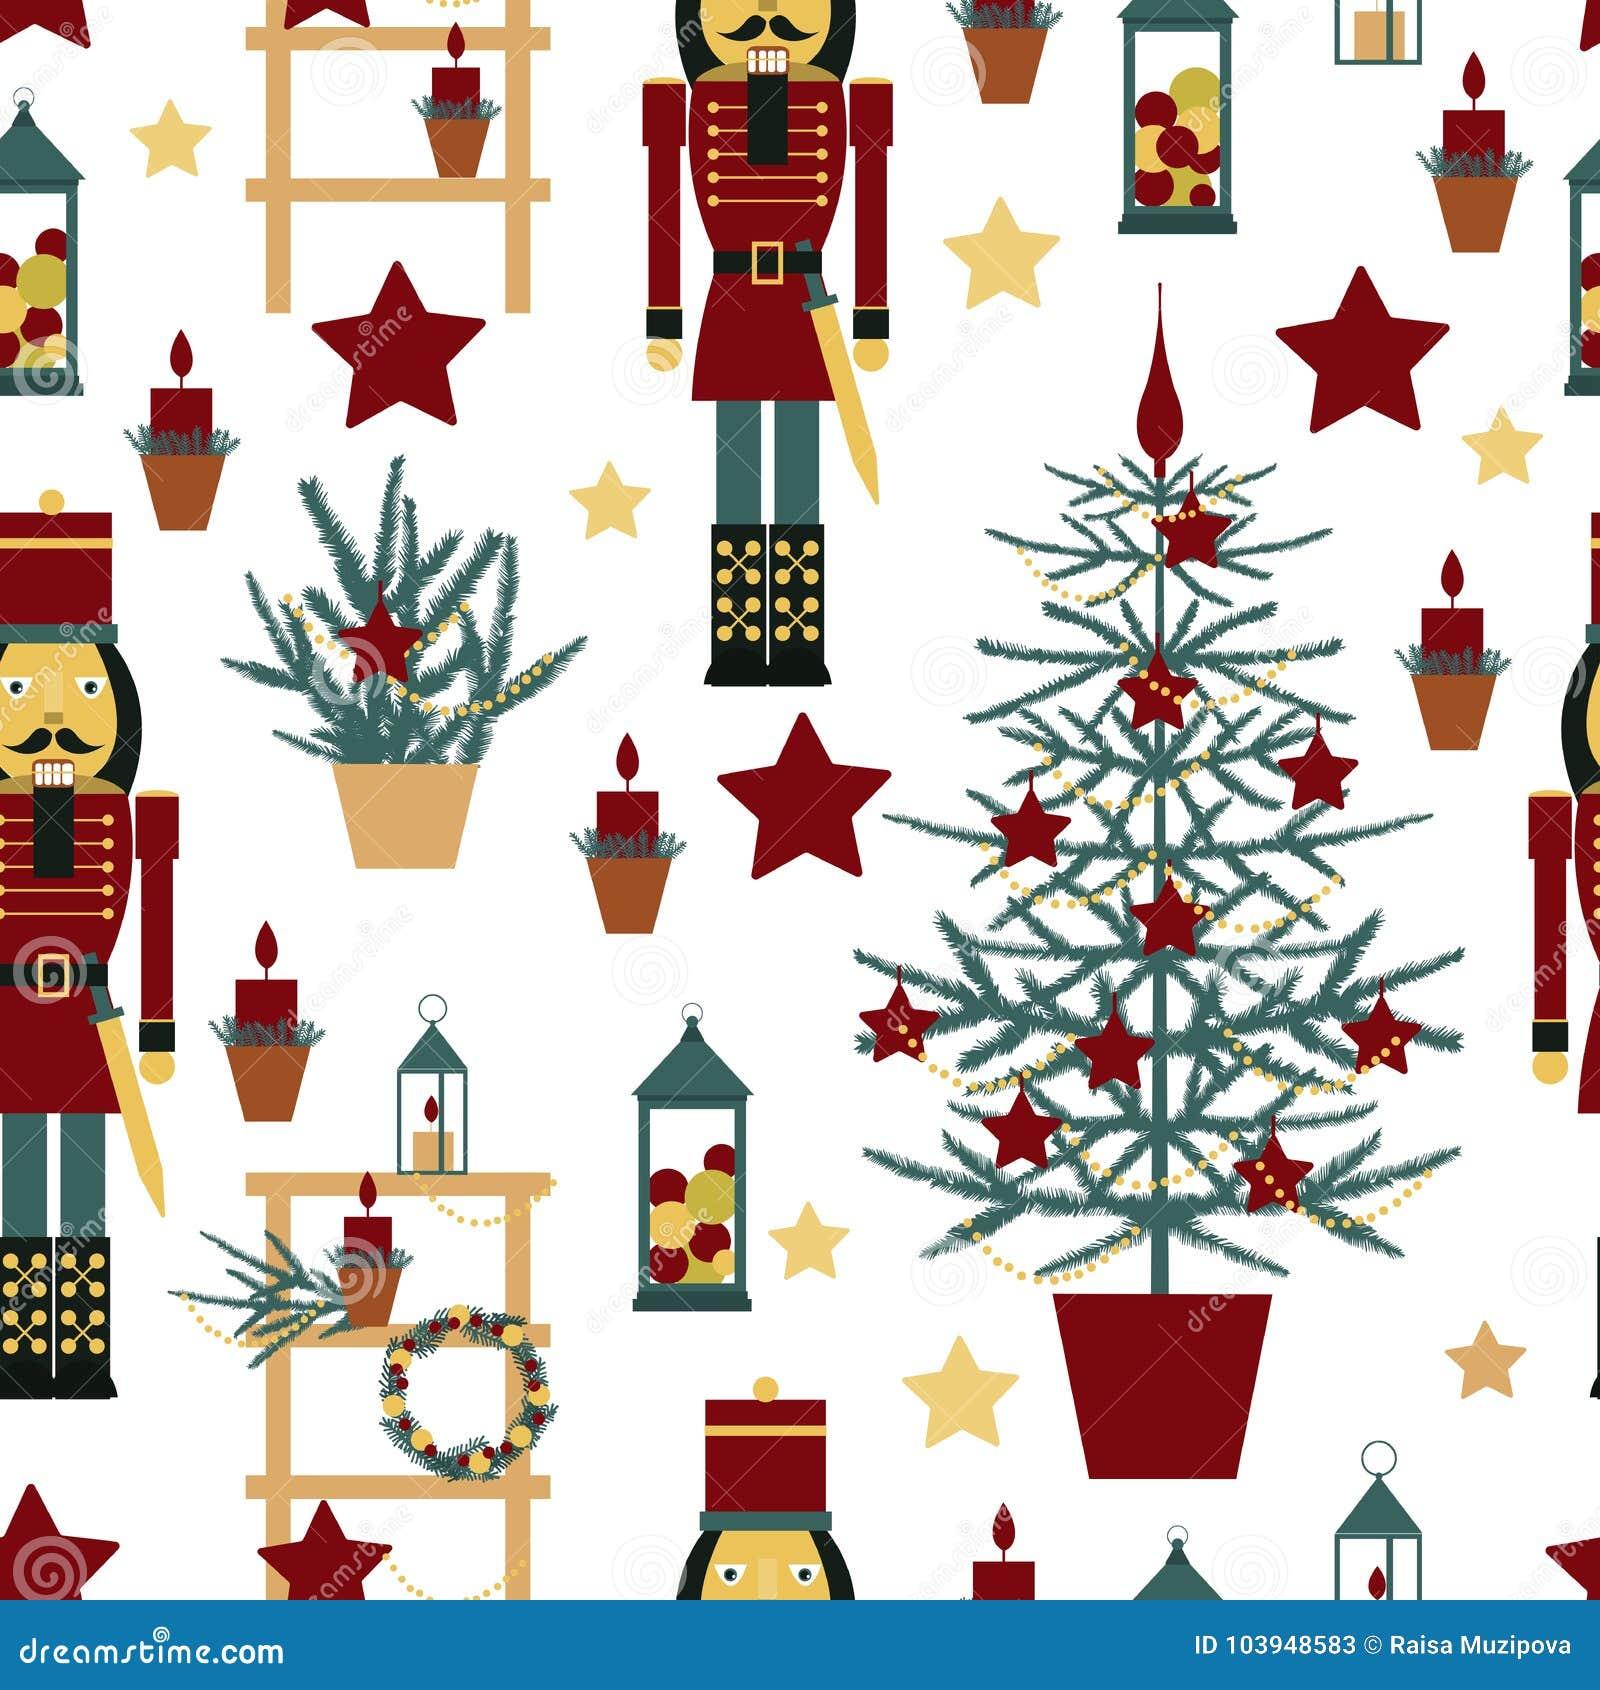 Nutcracker Christmas Tree Clipart.Christmas Seamless Pattern With Nutcracker Stock Vector